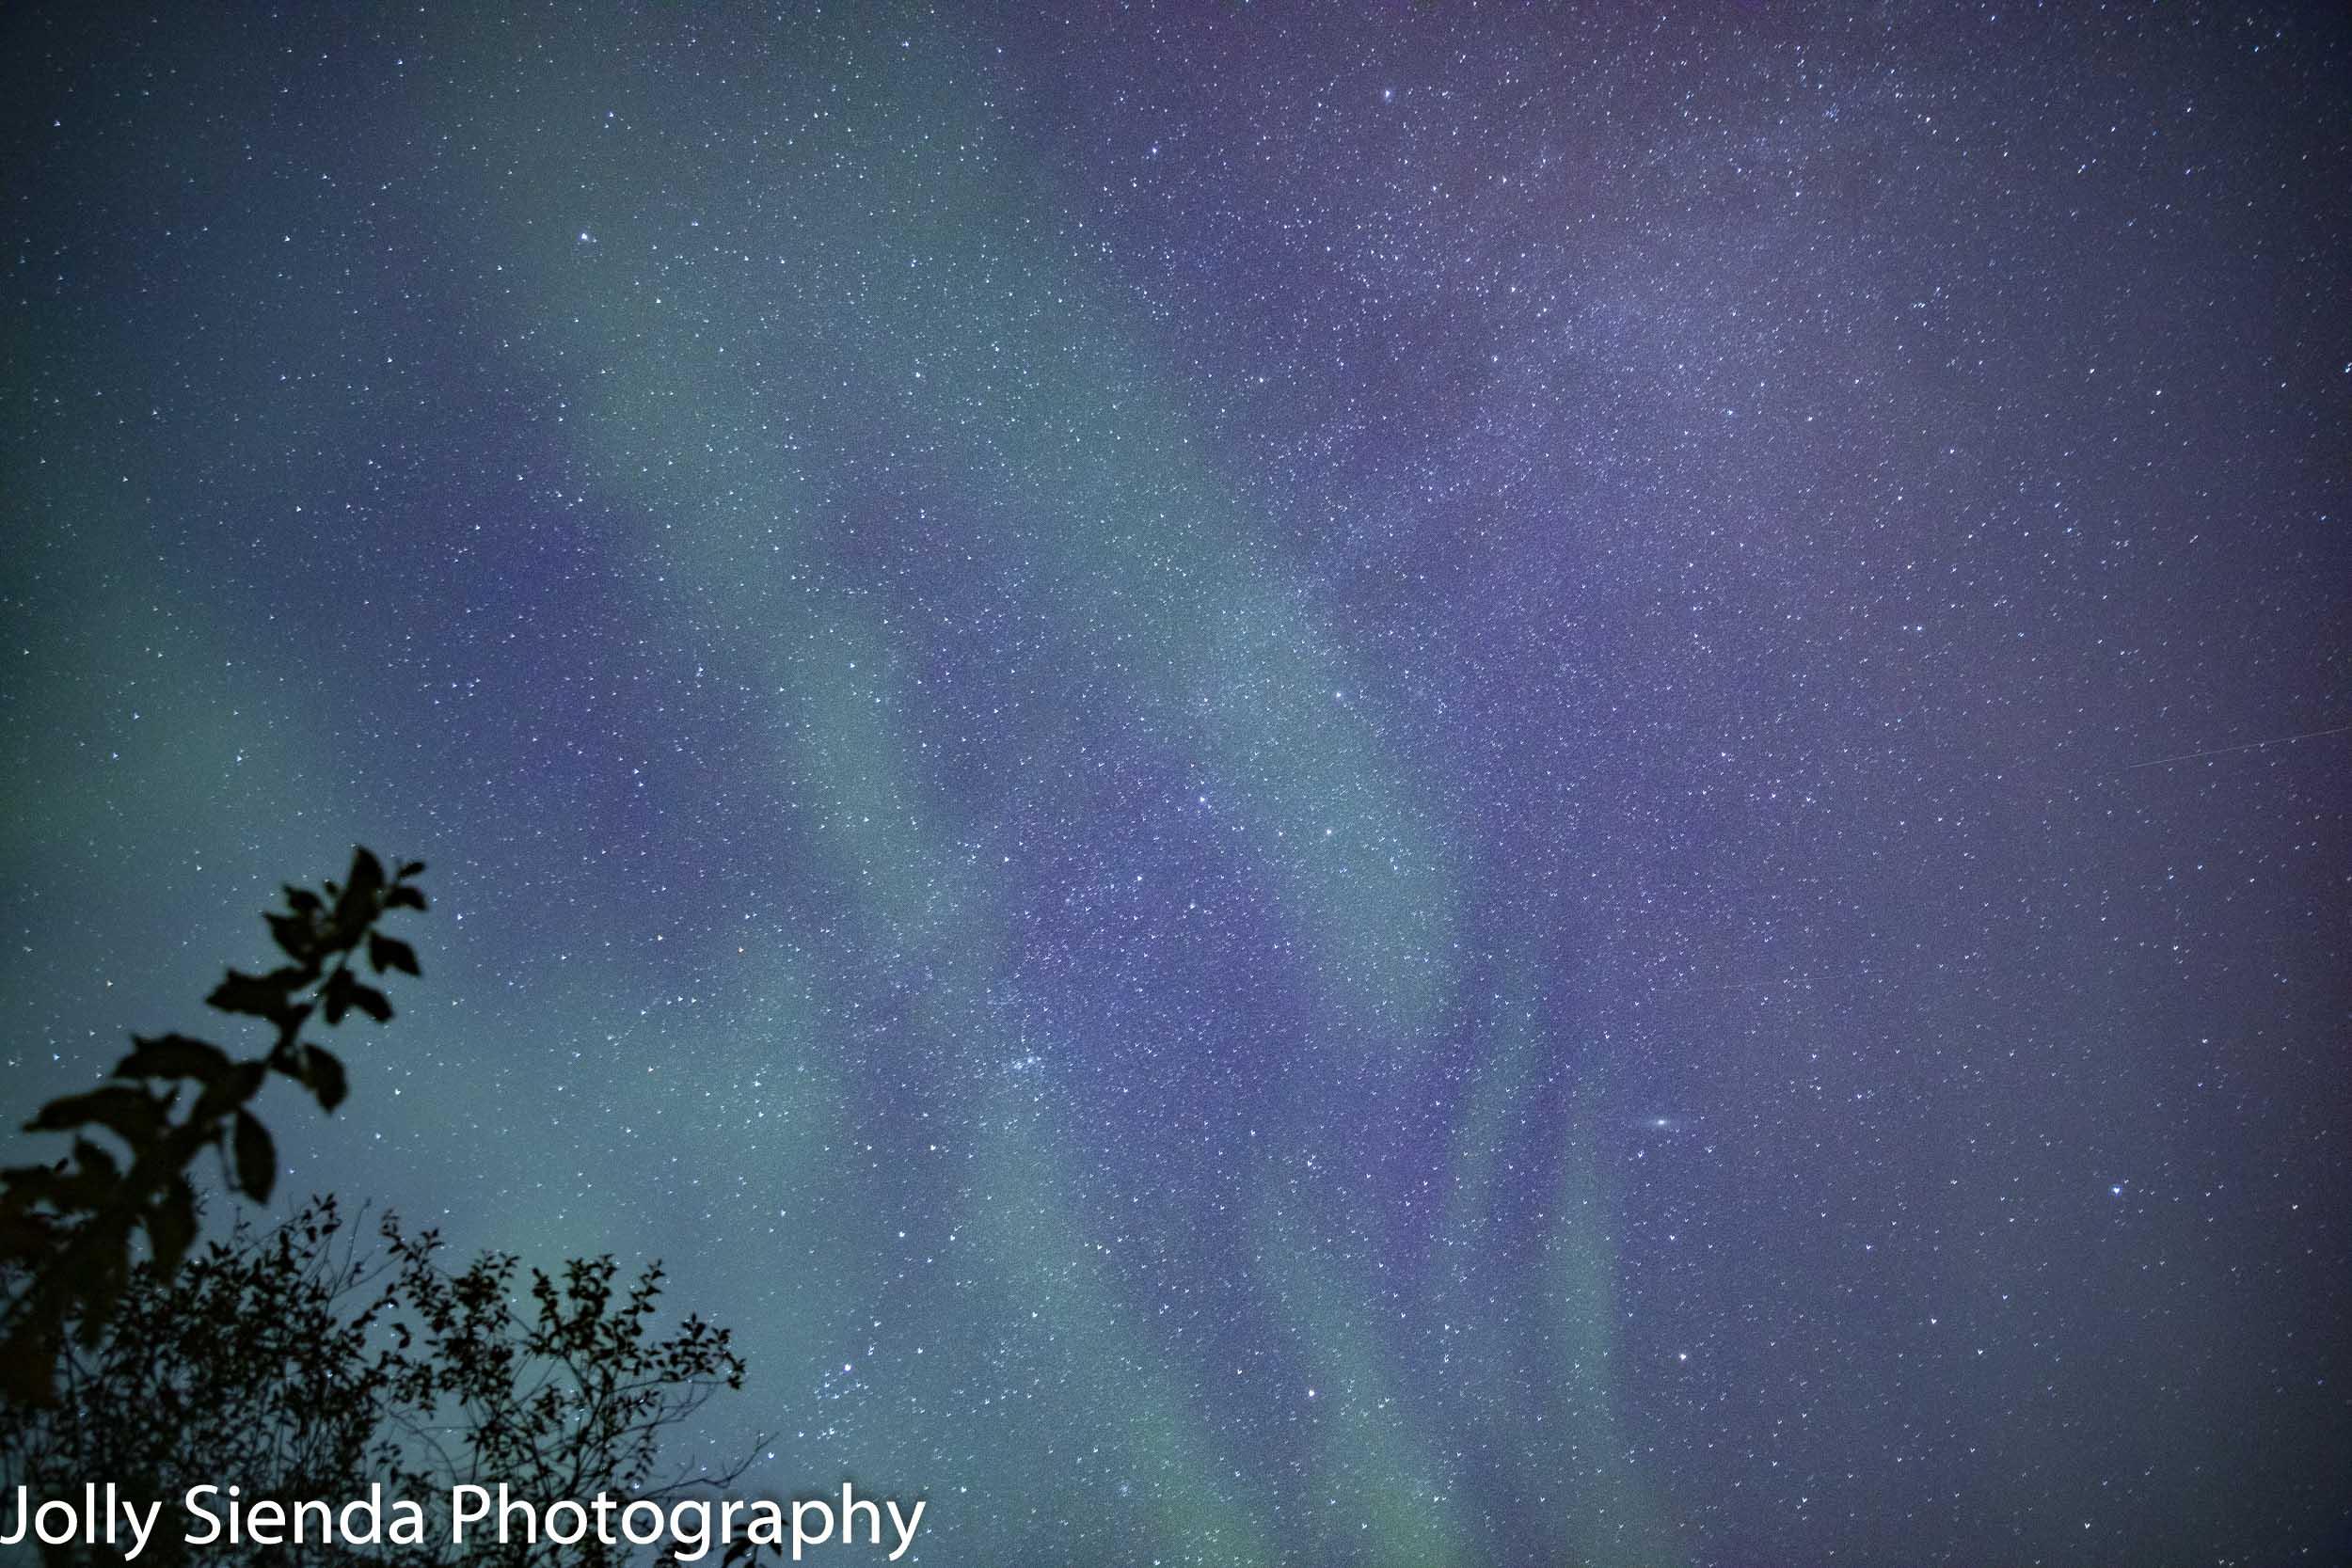 Fairbanks ranking at 3 for the Borealis Aurora Northern Lights, Fairbanks, September 5, 2019